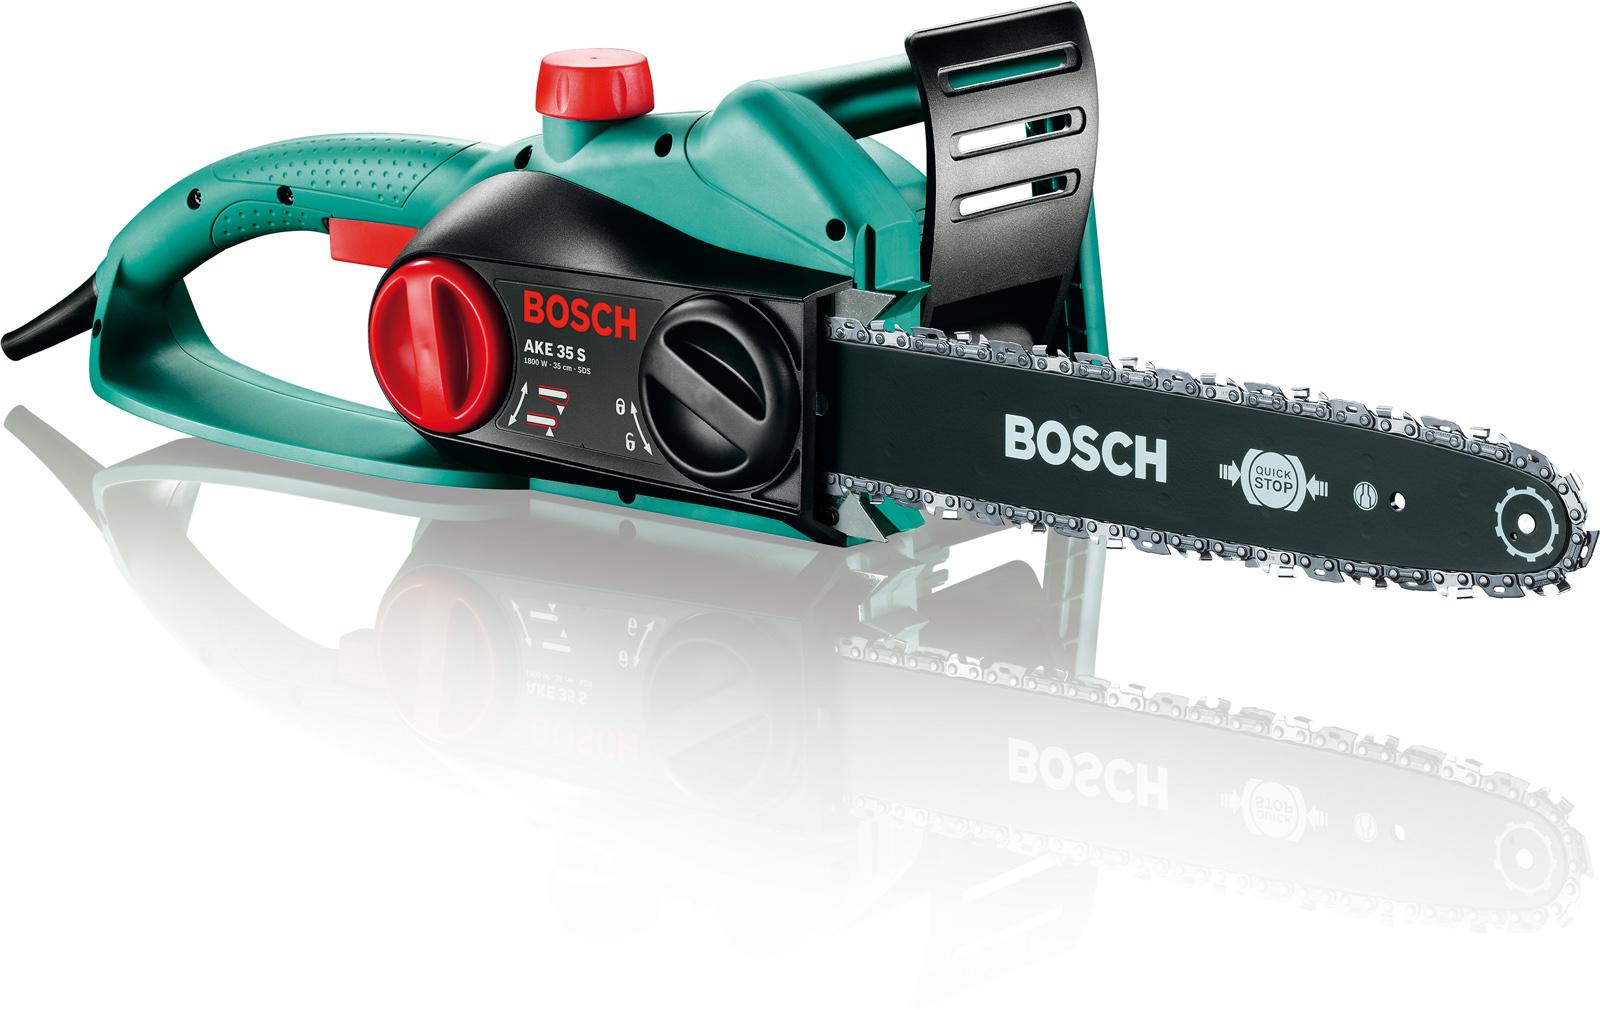 Пила цепная Bosch Ake 35 s (0.600.834.500) цепь для пилы bosch ake 30 17 8s и 30 li